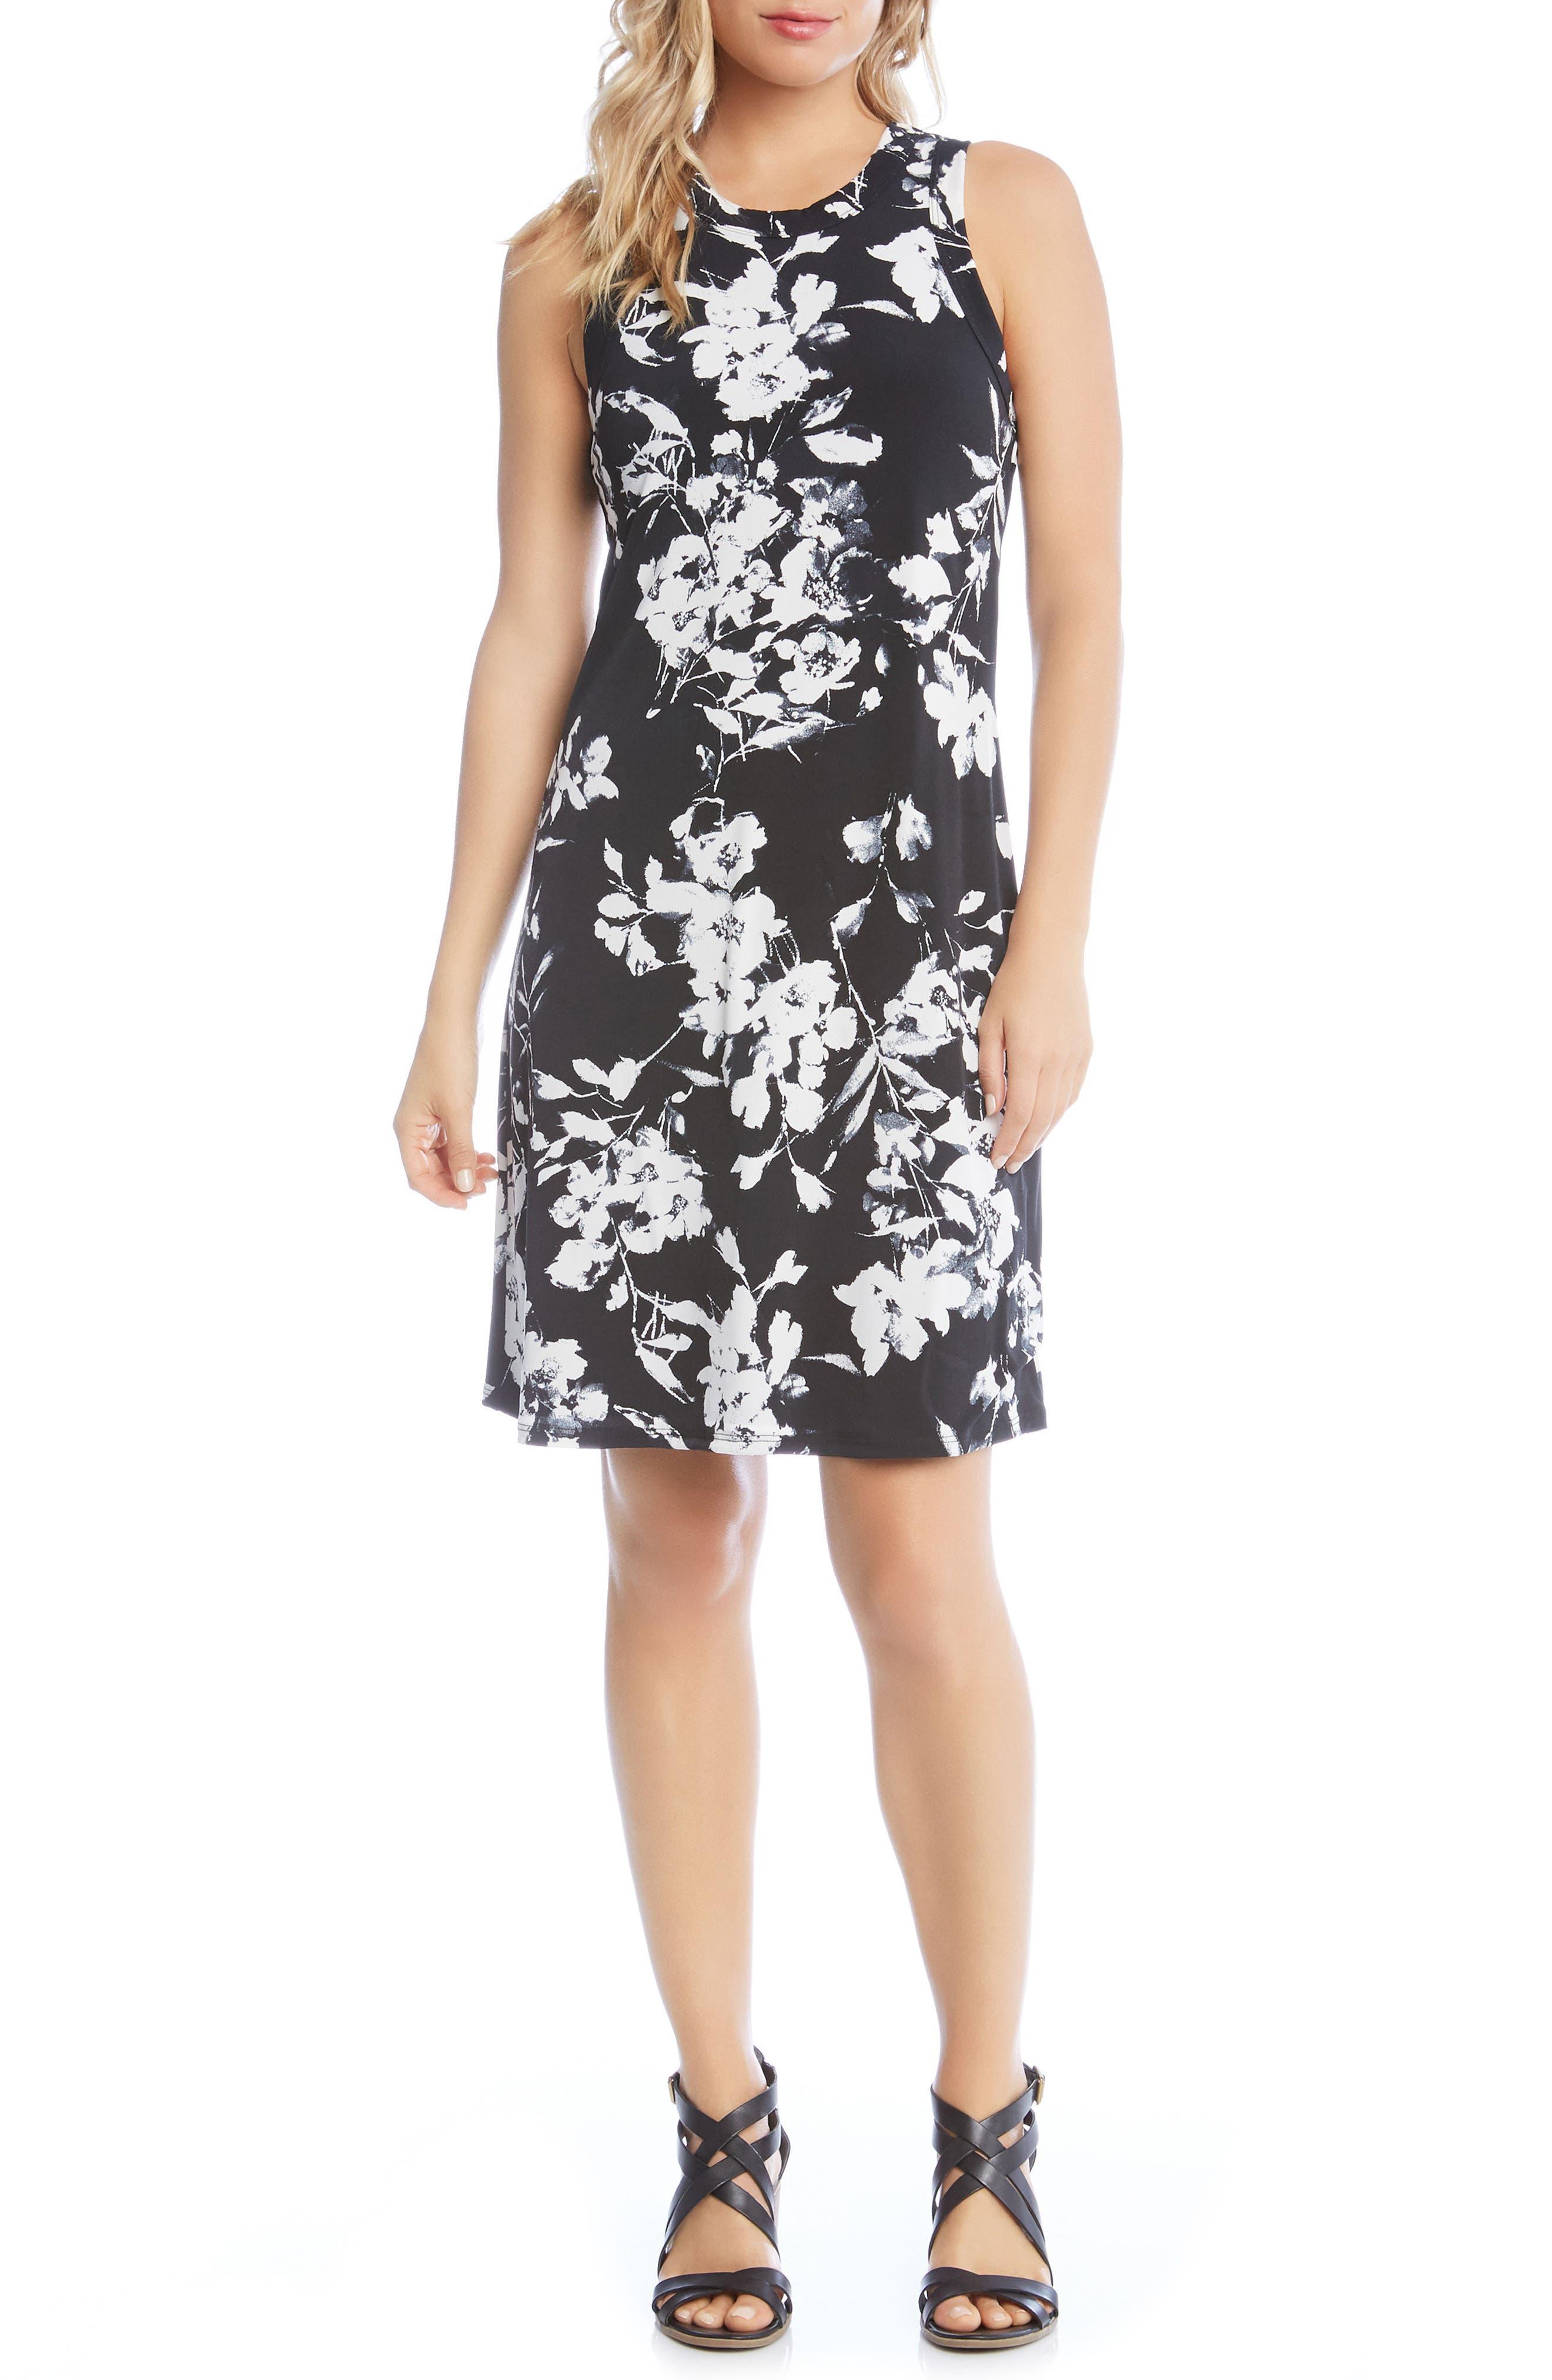 Floral Print Knit Dress,                         Main,                         color, Black/ Off White